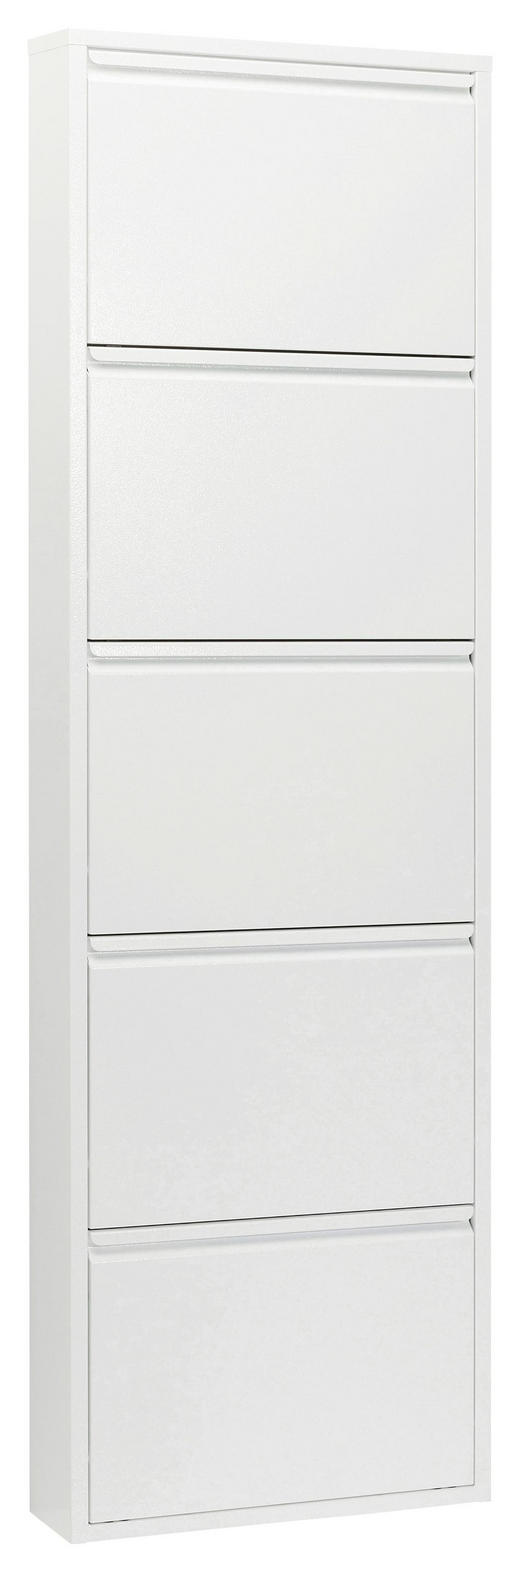 SCHUHKIPPER Weiß - Weiß, Basics, Metall (50/170/14cm) - Kare-Design